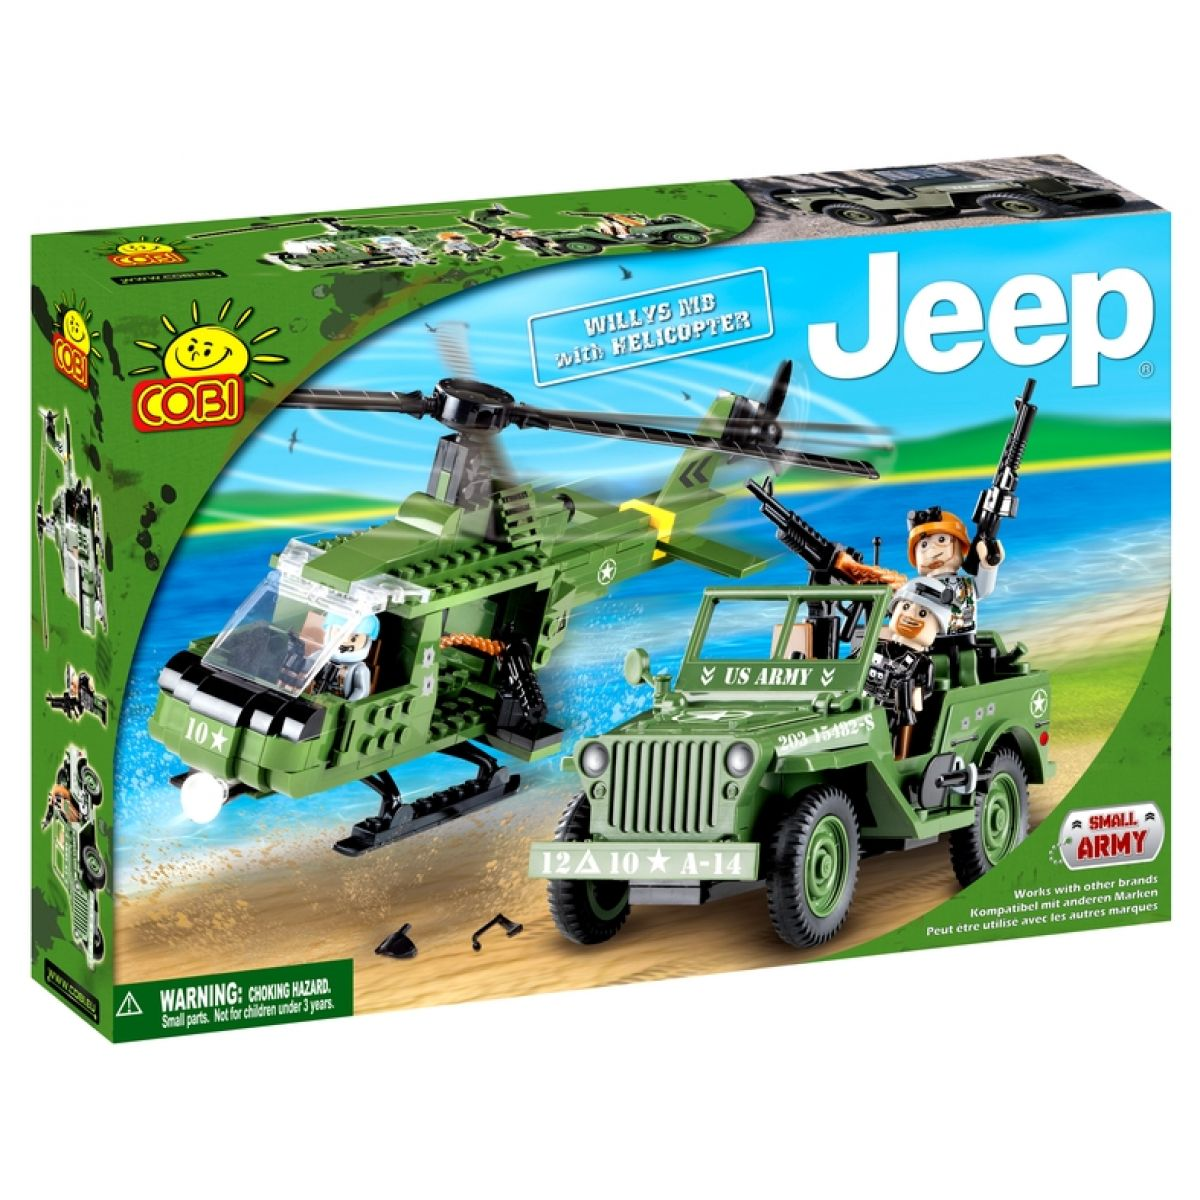 COBI 24252 - Jeep Willys - JEEP Willys MB